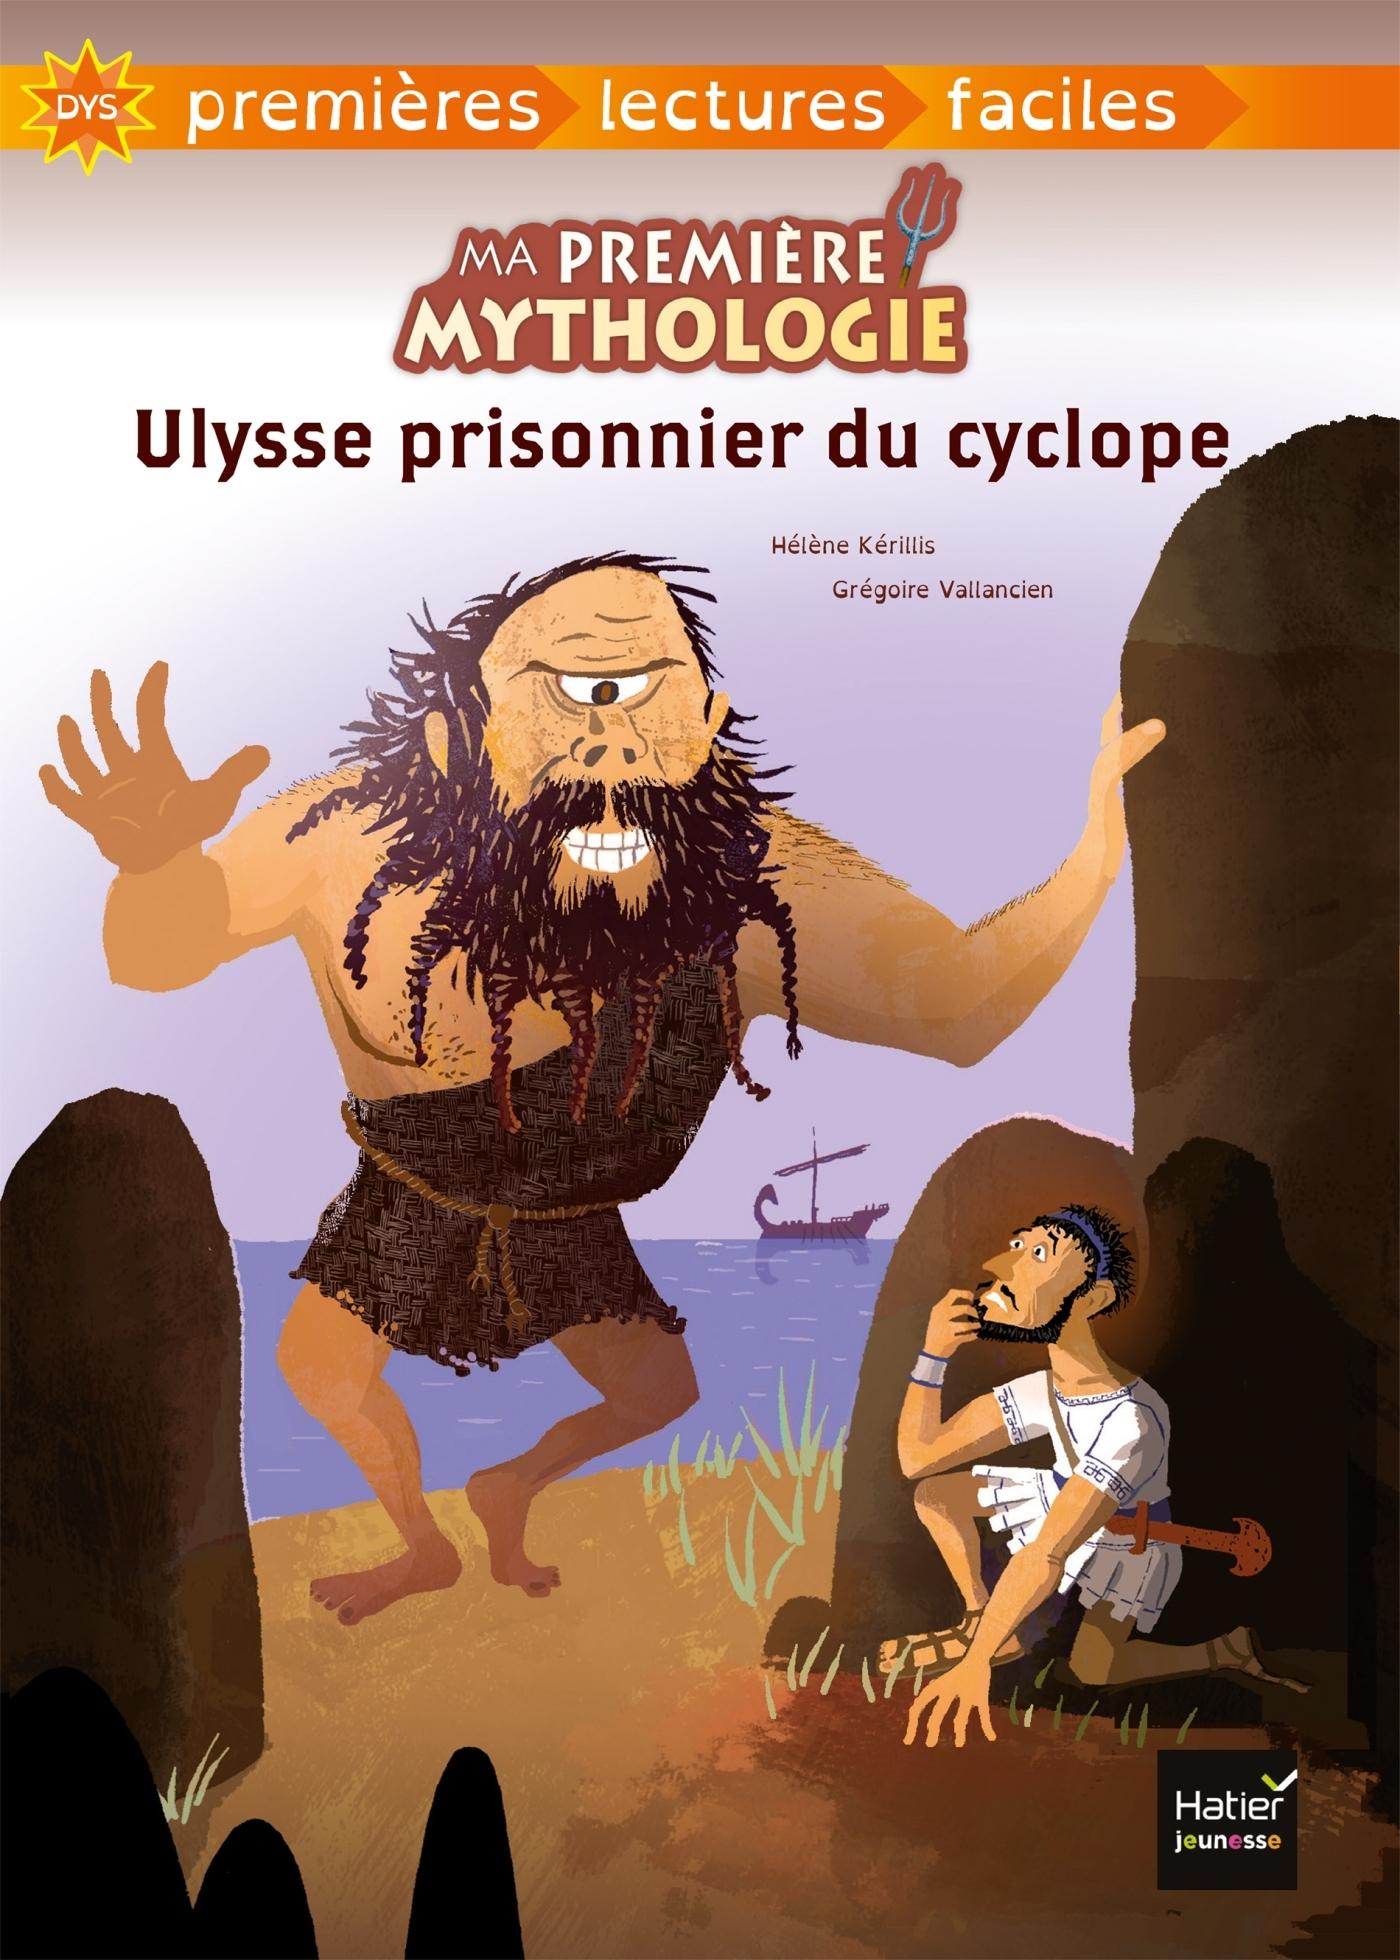 MA PREMIERE MYTHOLOGIE - T07 - ULYSSE PRISONNIER DU CYCLOPE ADAPTE